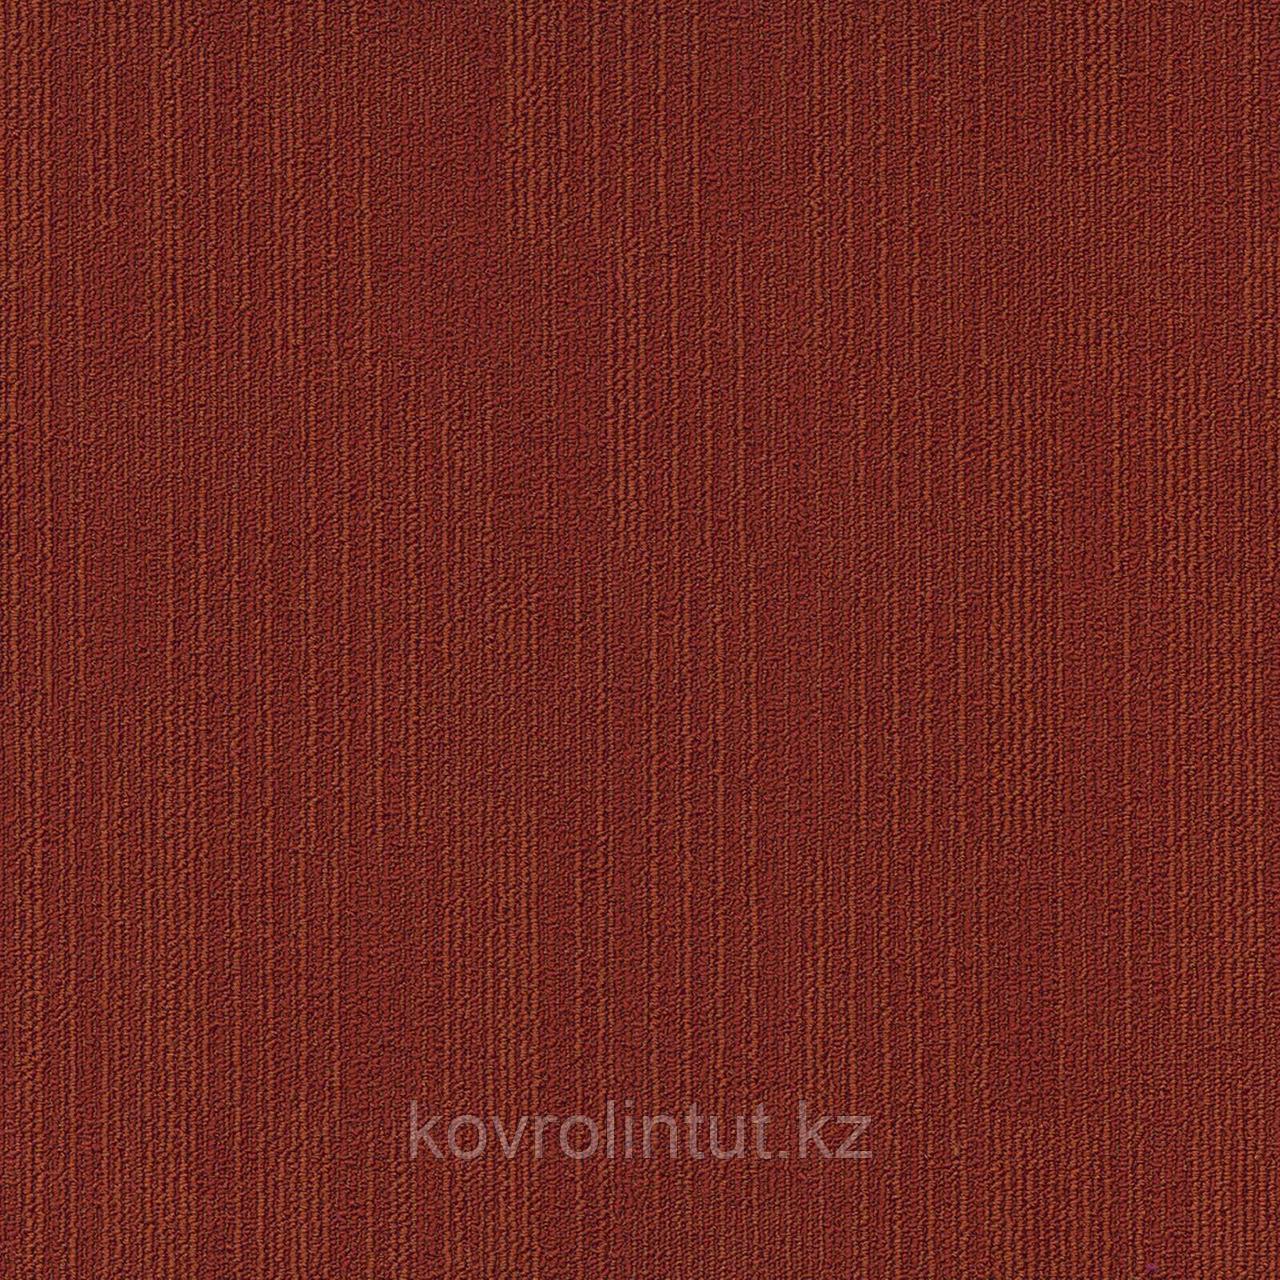 Плитка ковровая Modulyss Fashion& 332, 100% PA